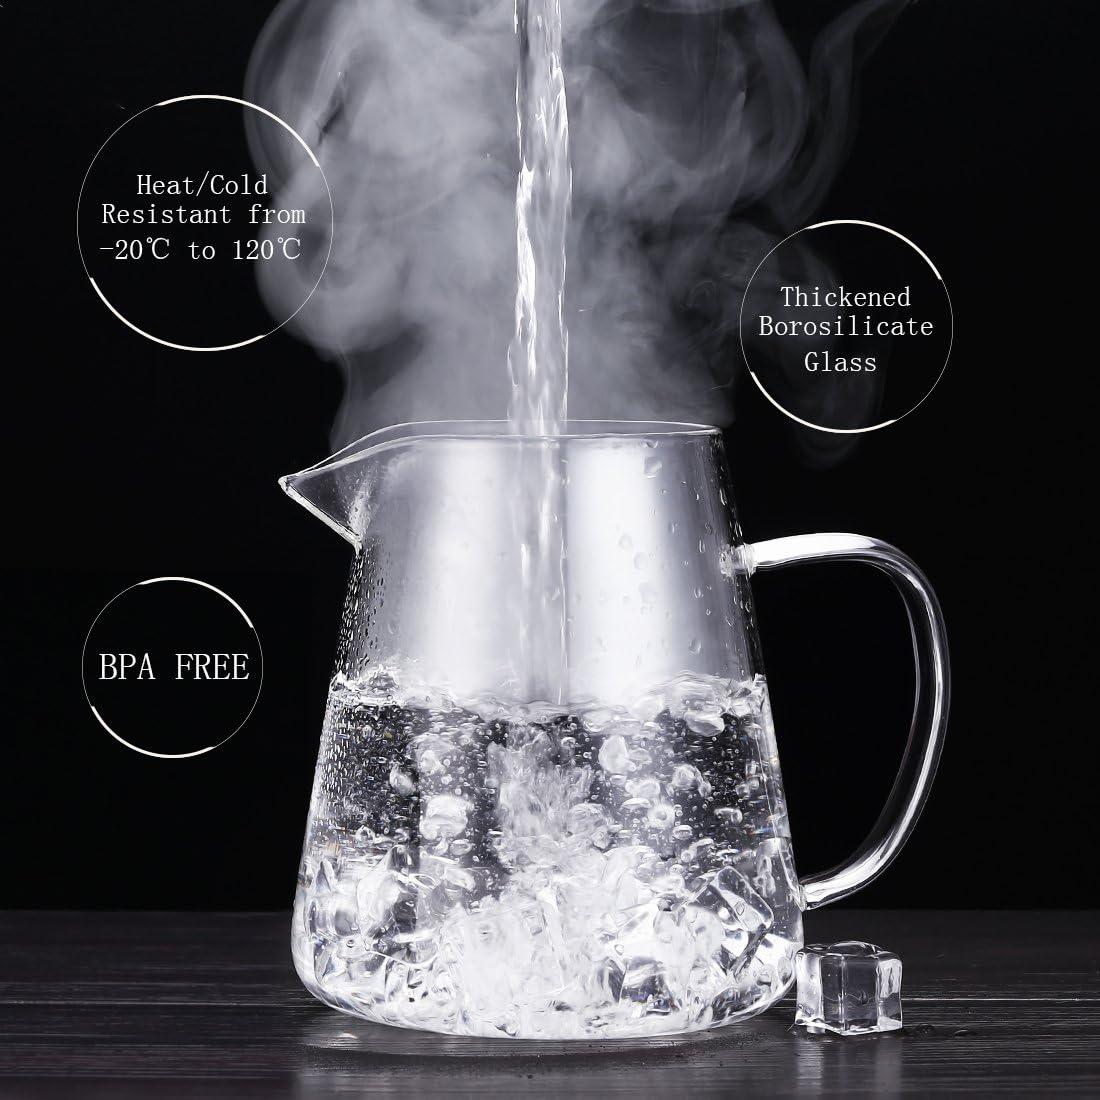 oneisall dgybl018/750/ml cristal de borosilicato resistente al calor tetera con infusor de acero inoxidable para hojas de t/é sueltas infusor de t/é olla de t/é Flor,